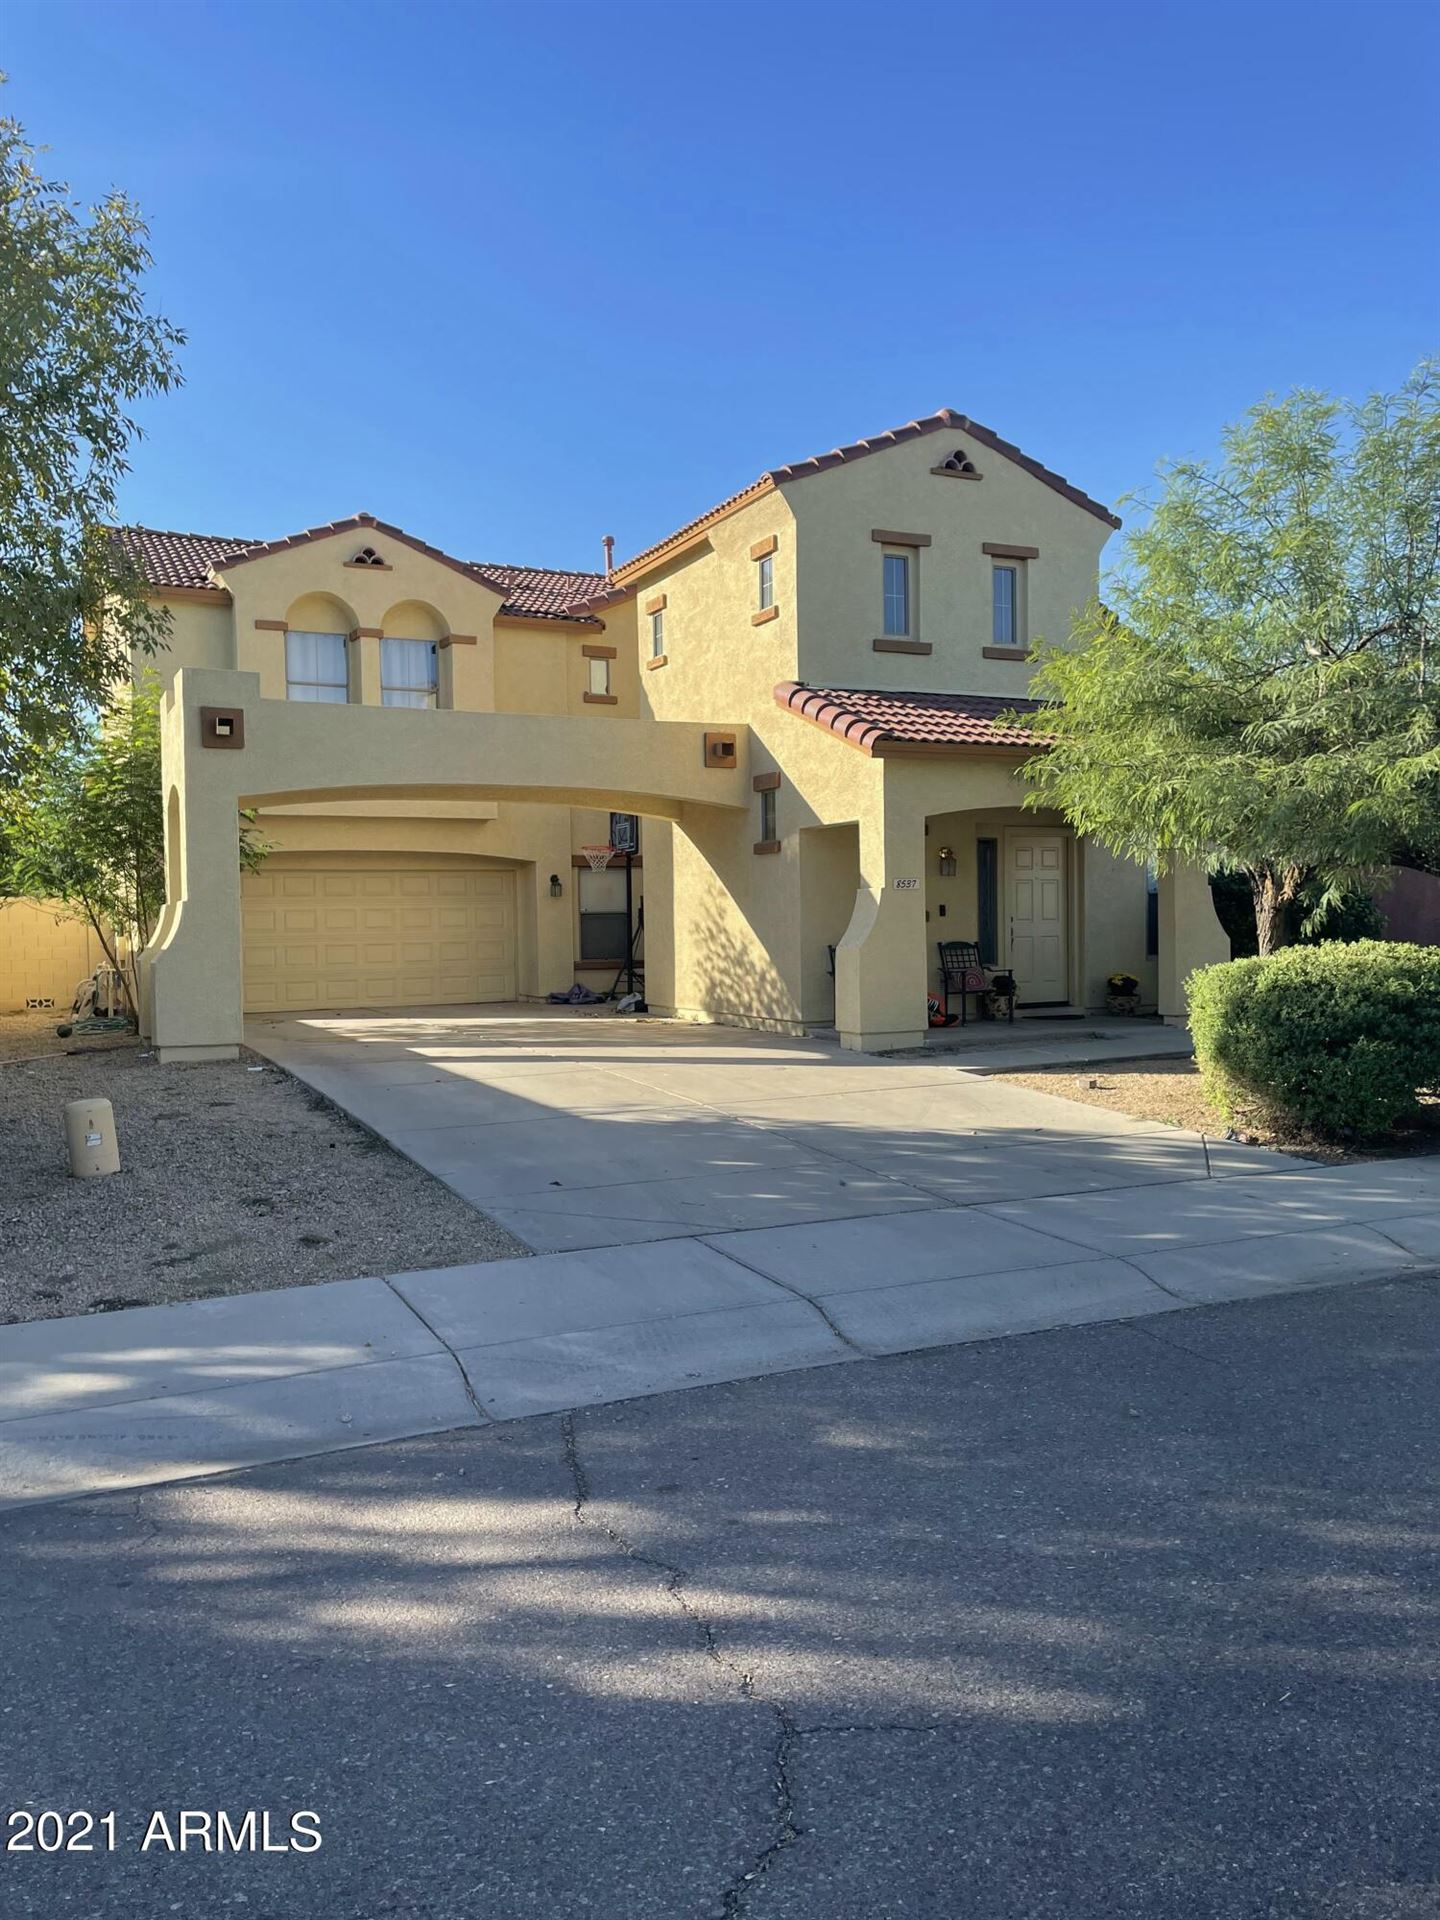 Photo of 8537 W Preston Lane, Tolleson, AZ 85353 (MLS # 6308292)